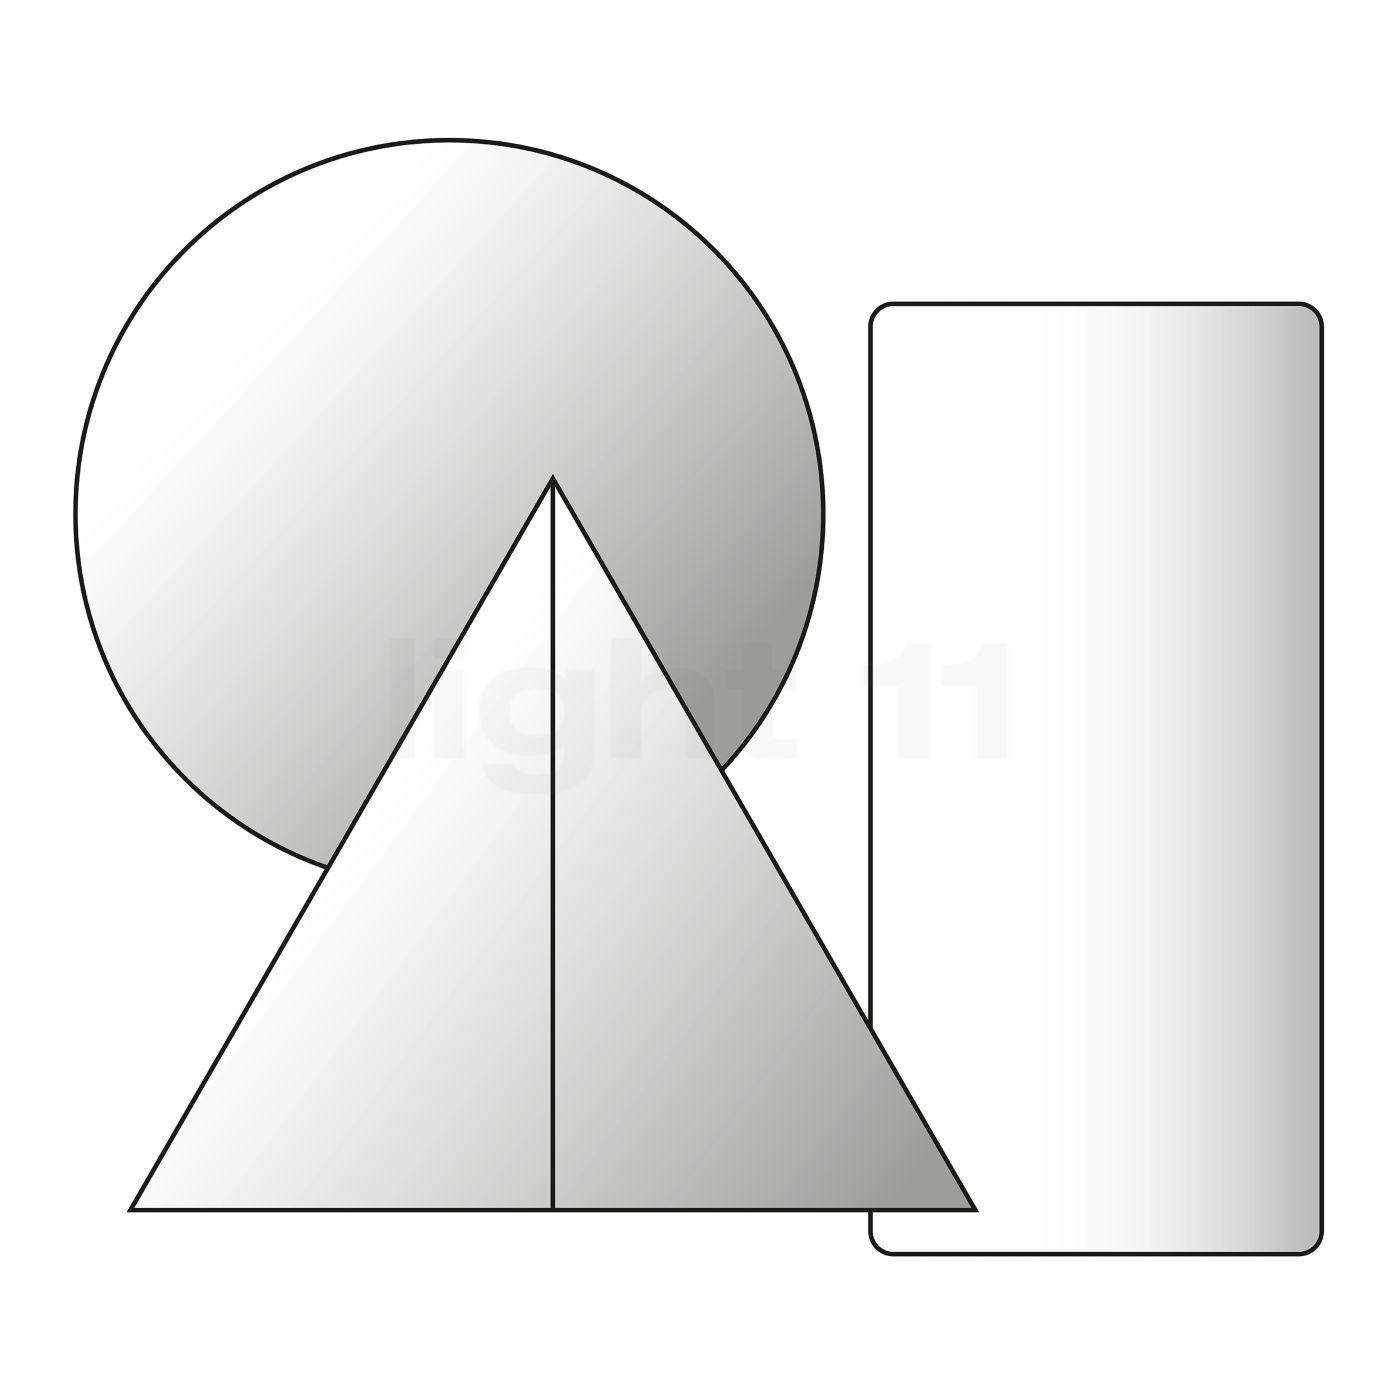 DCW Halterungsring für In The Tube 100, Aluminium ITT ANGLE 1 - 100